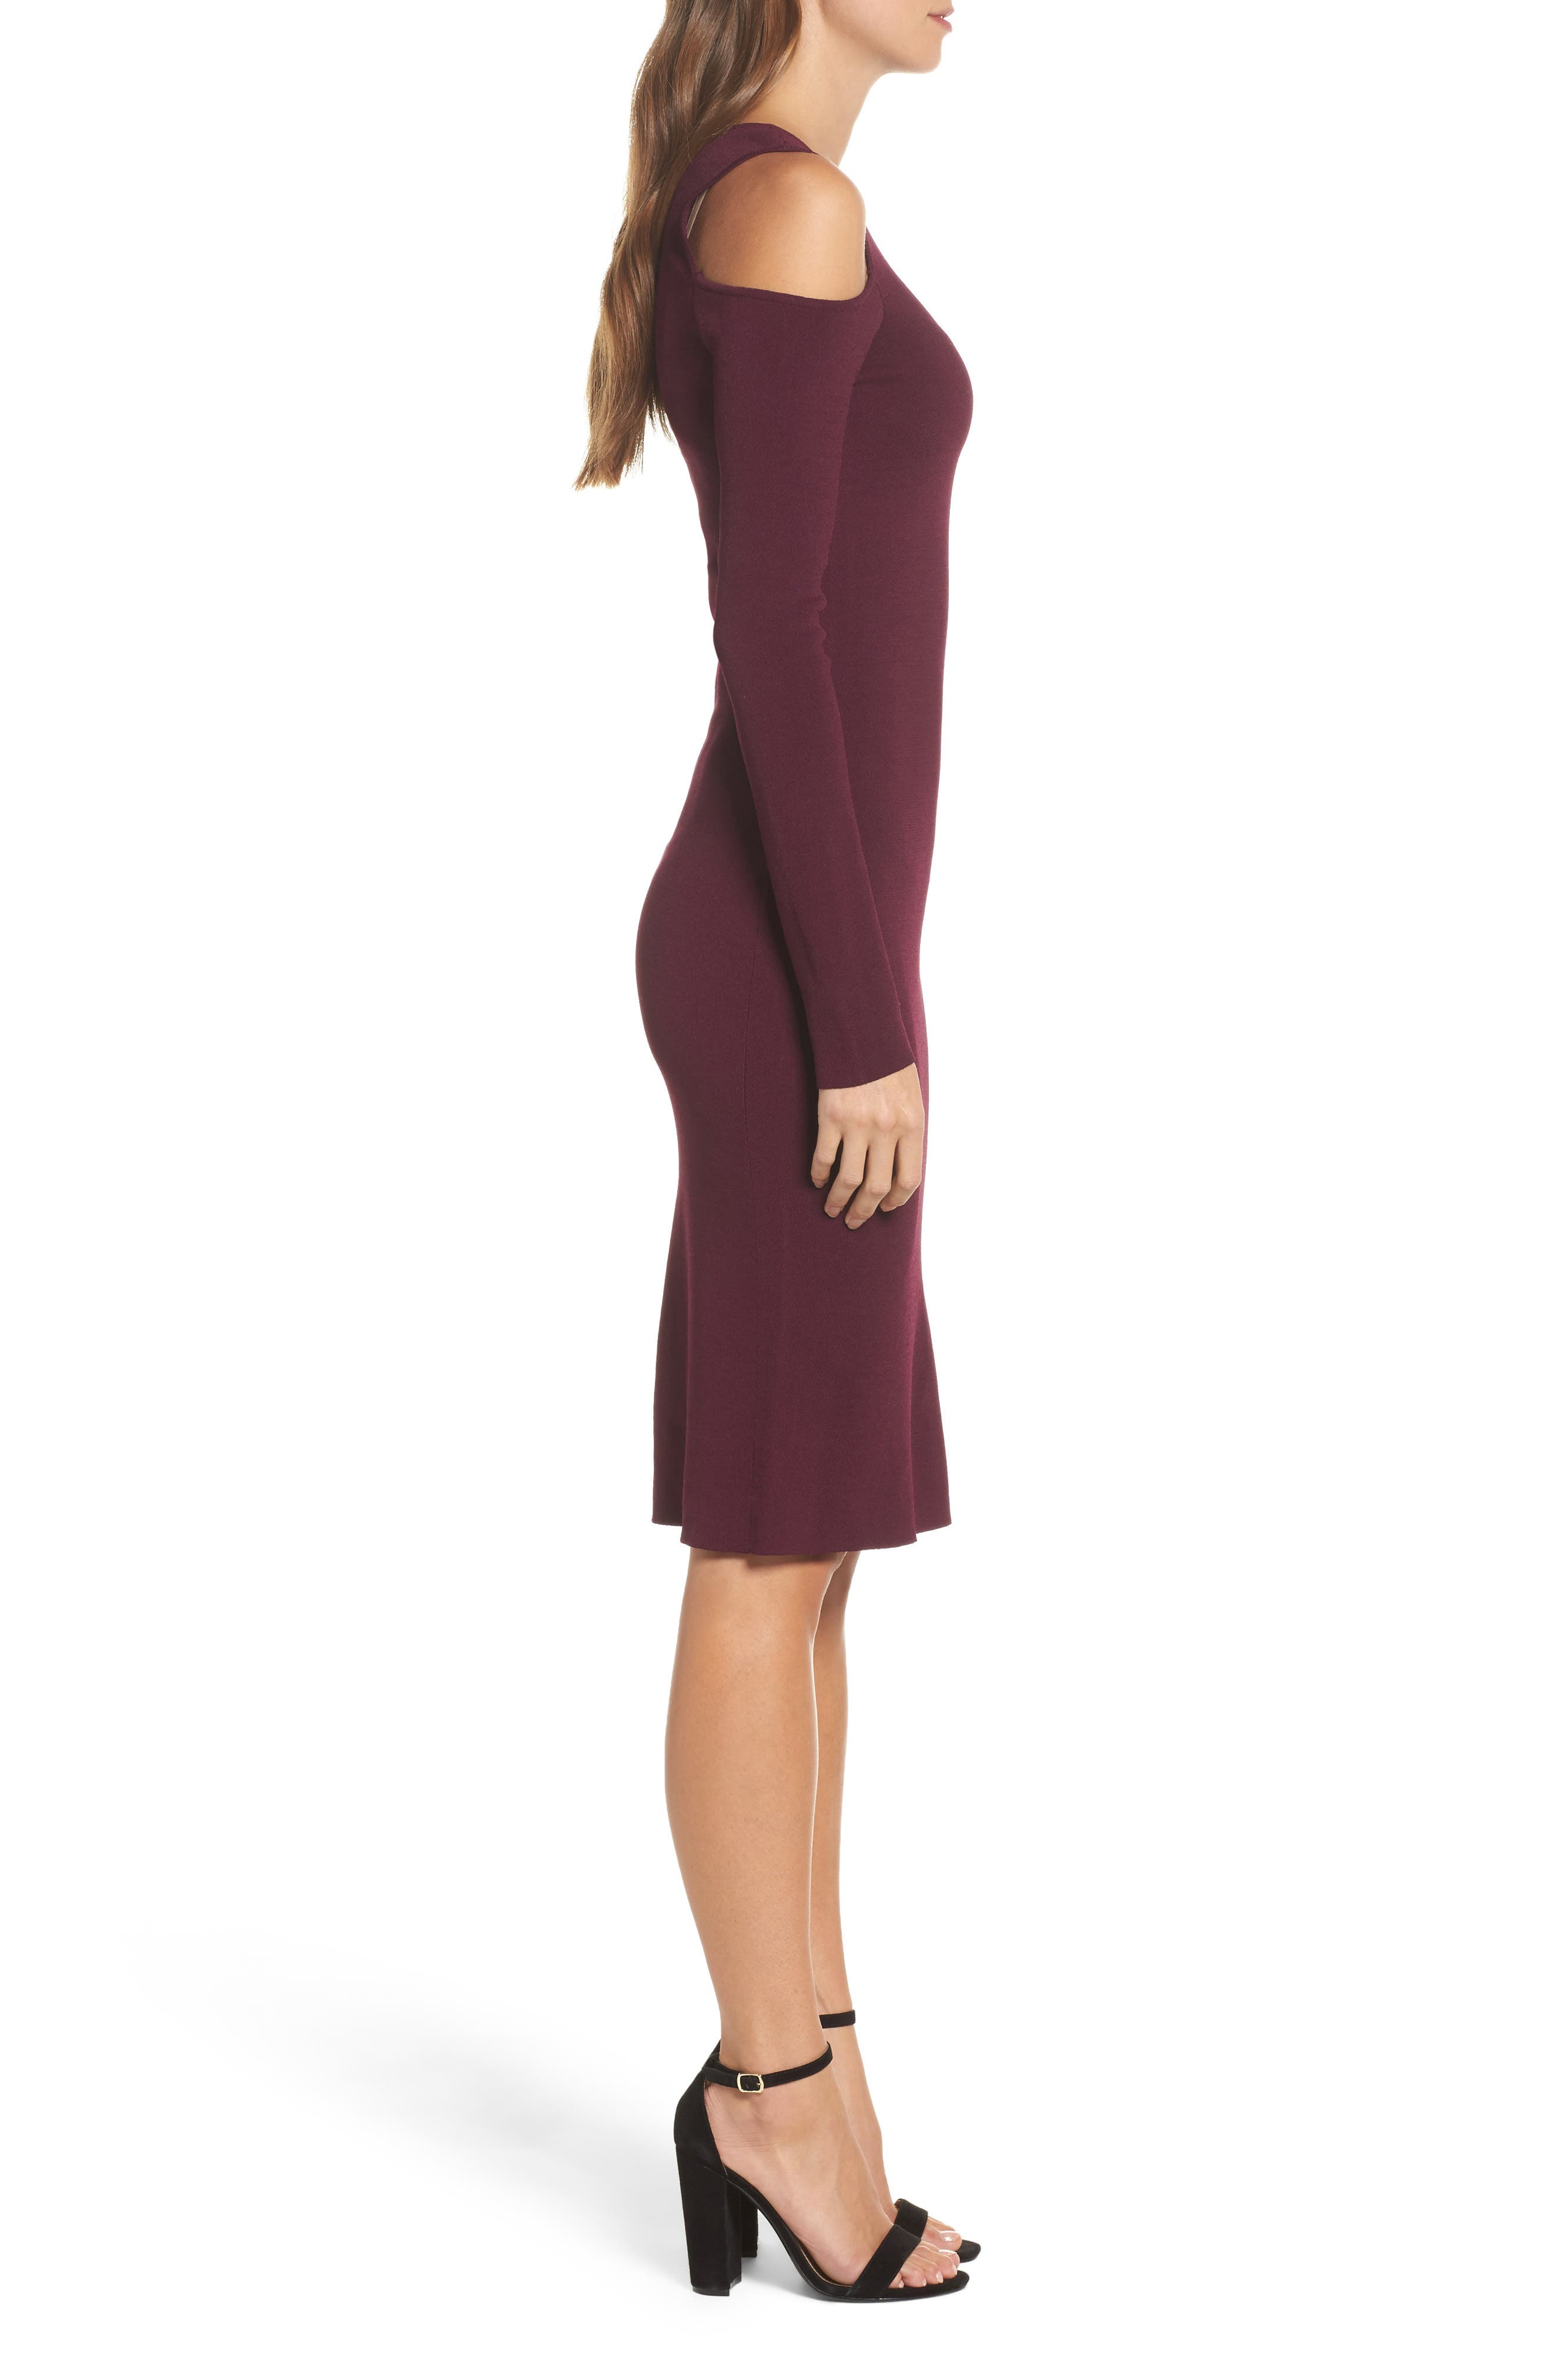 ELIZA J, Cold Shoulder Knit Body-Con Dress, Alternate thumbnail 3, color, 500